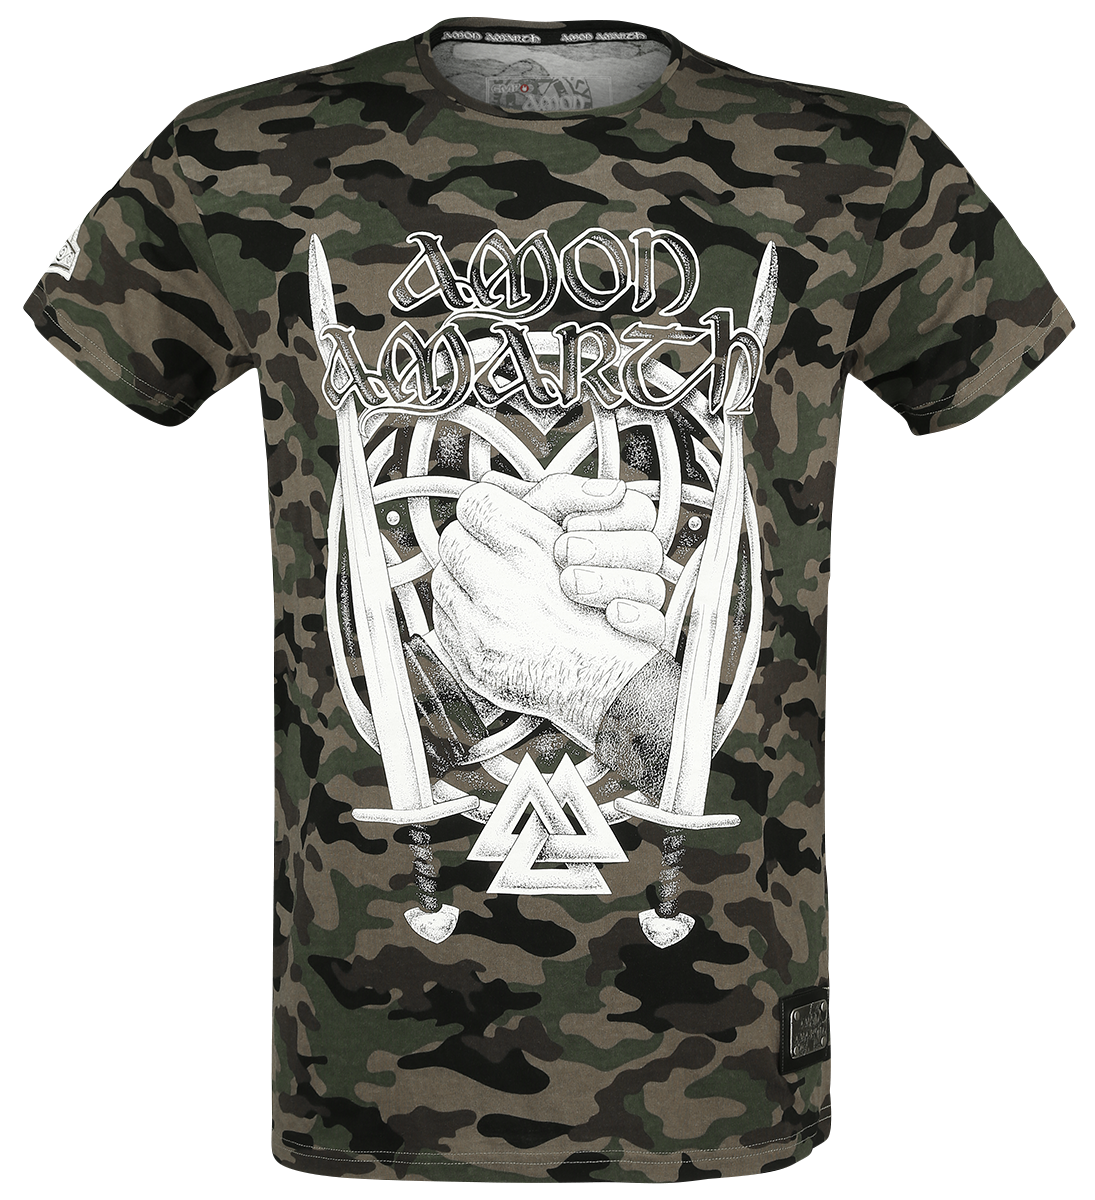 Amon Amarth - EMP Signature Collection - T-Shirt - camouflage image